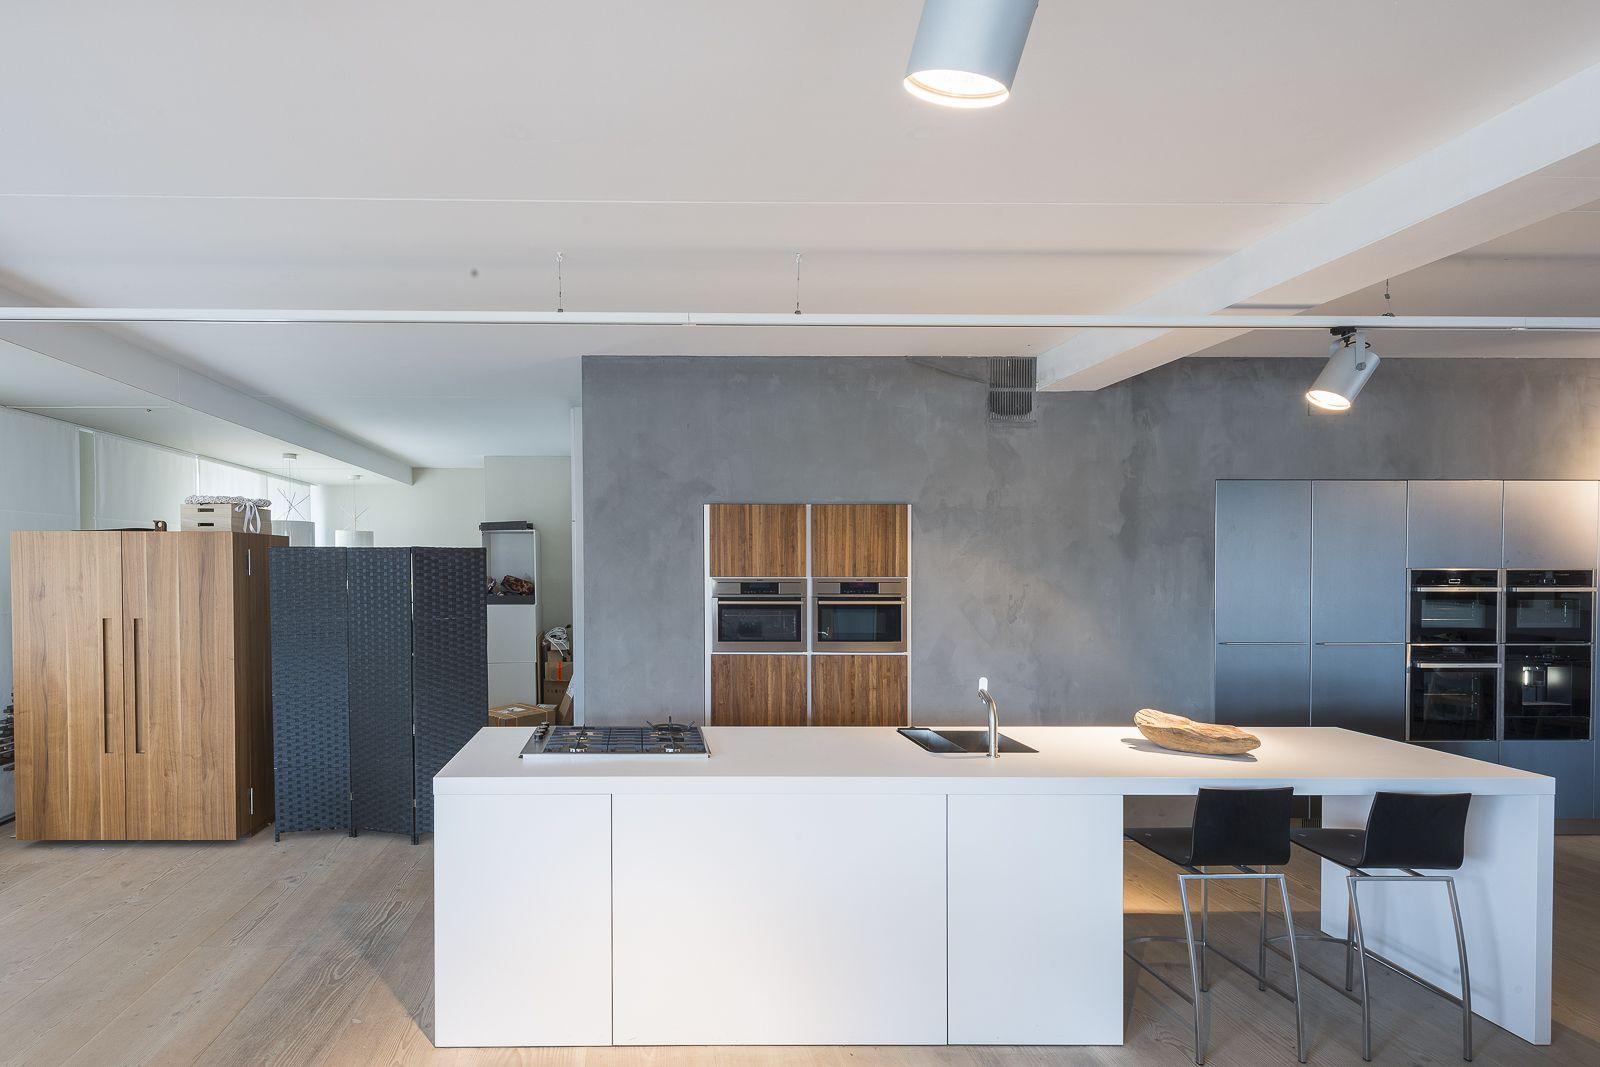 bulthaup b1 44163. Black Bedroom Furniture Sets. Home Design Ideas